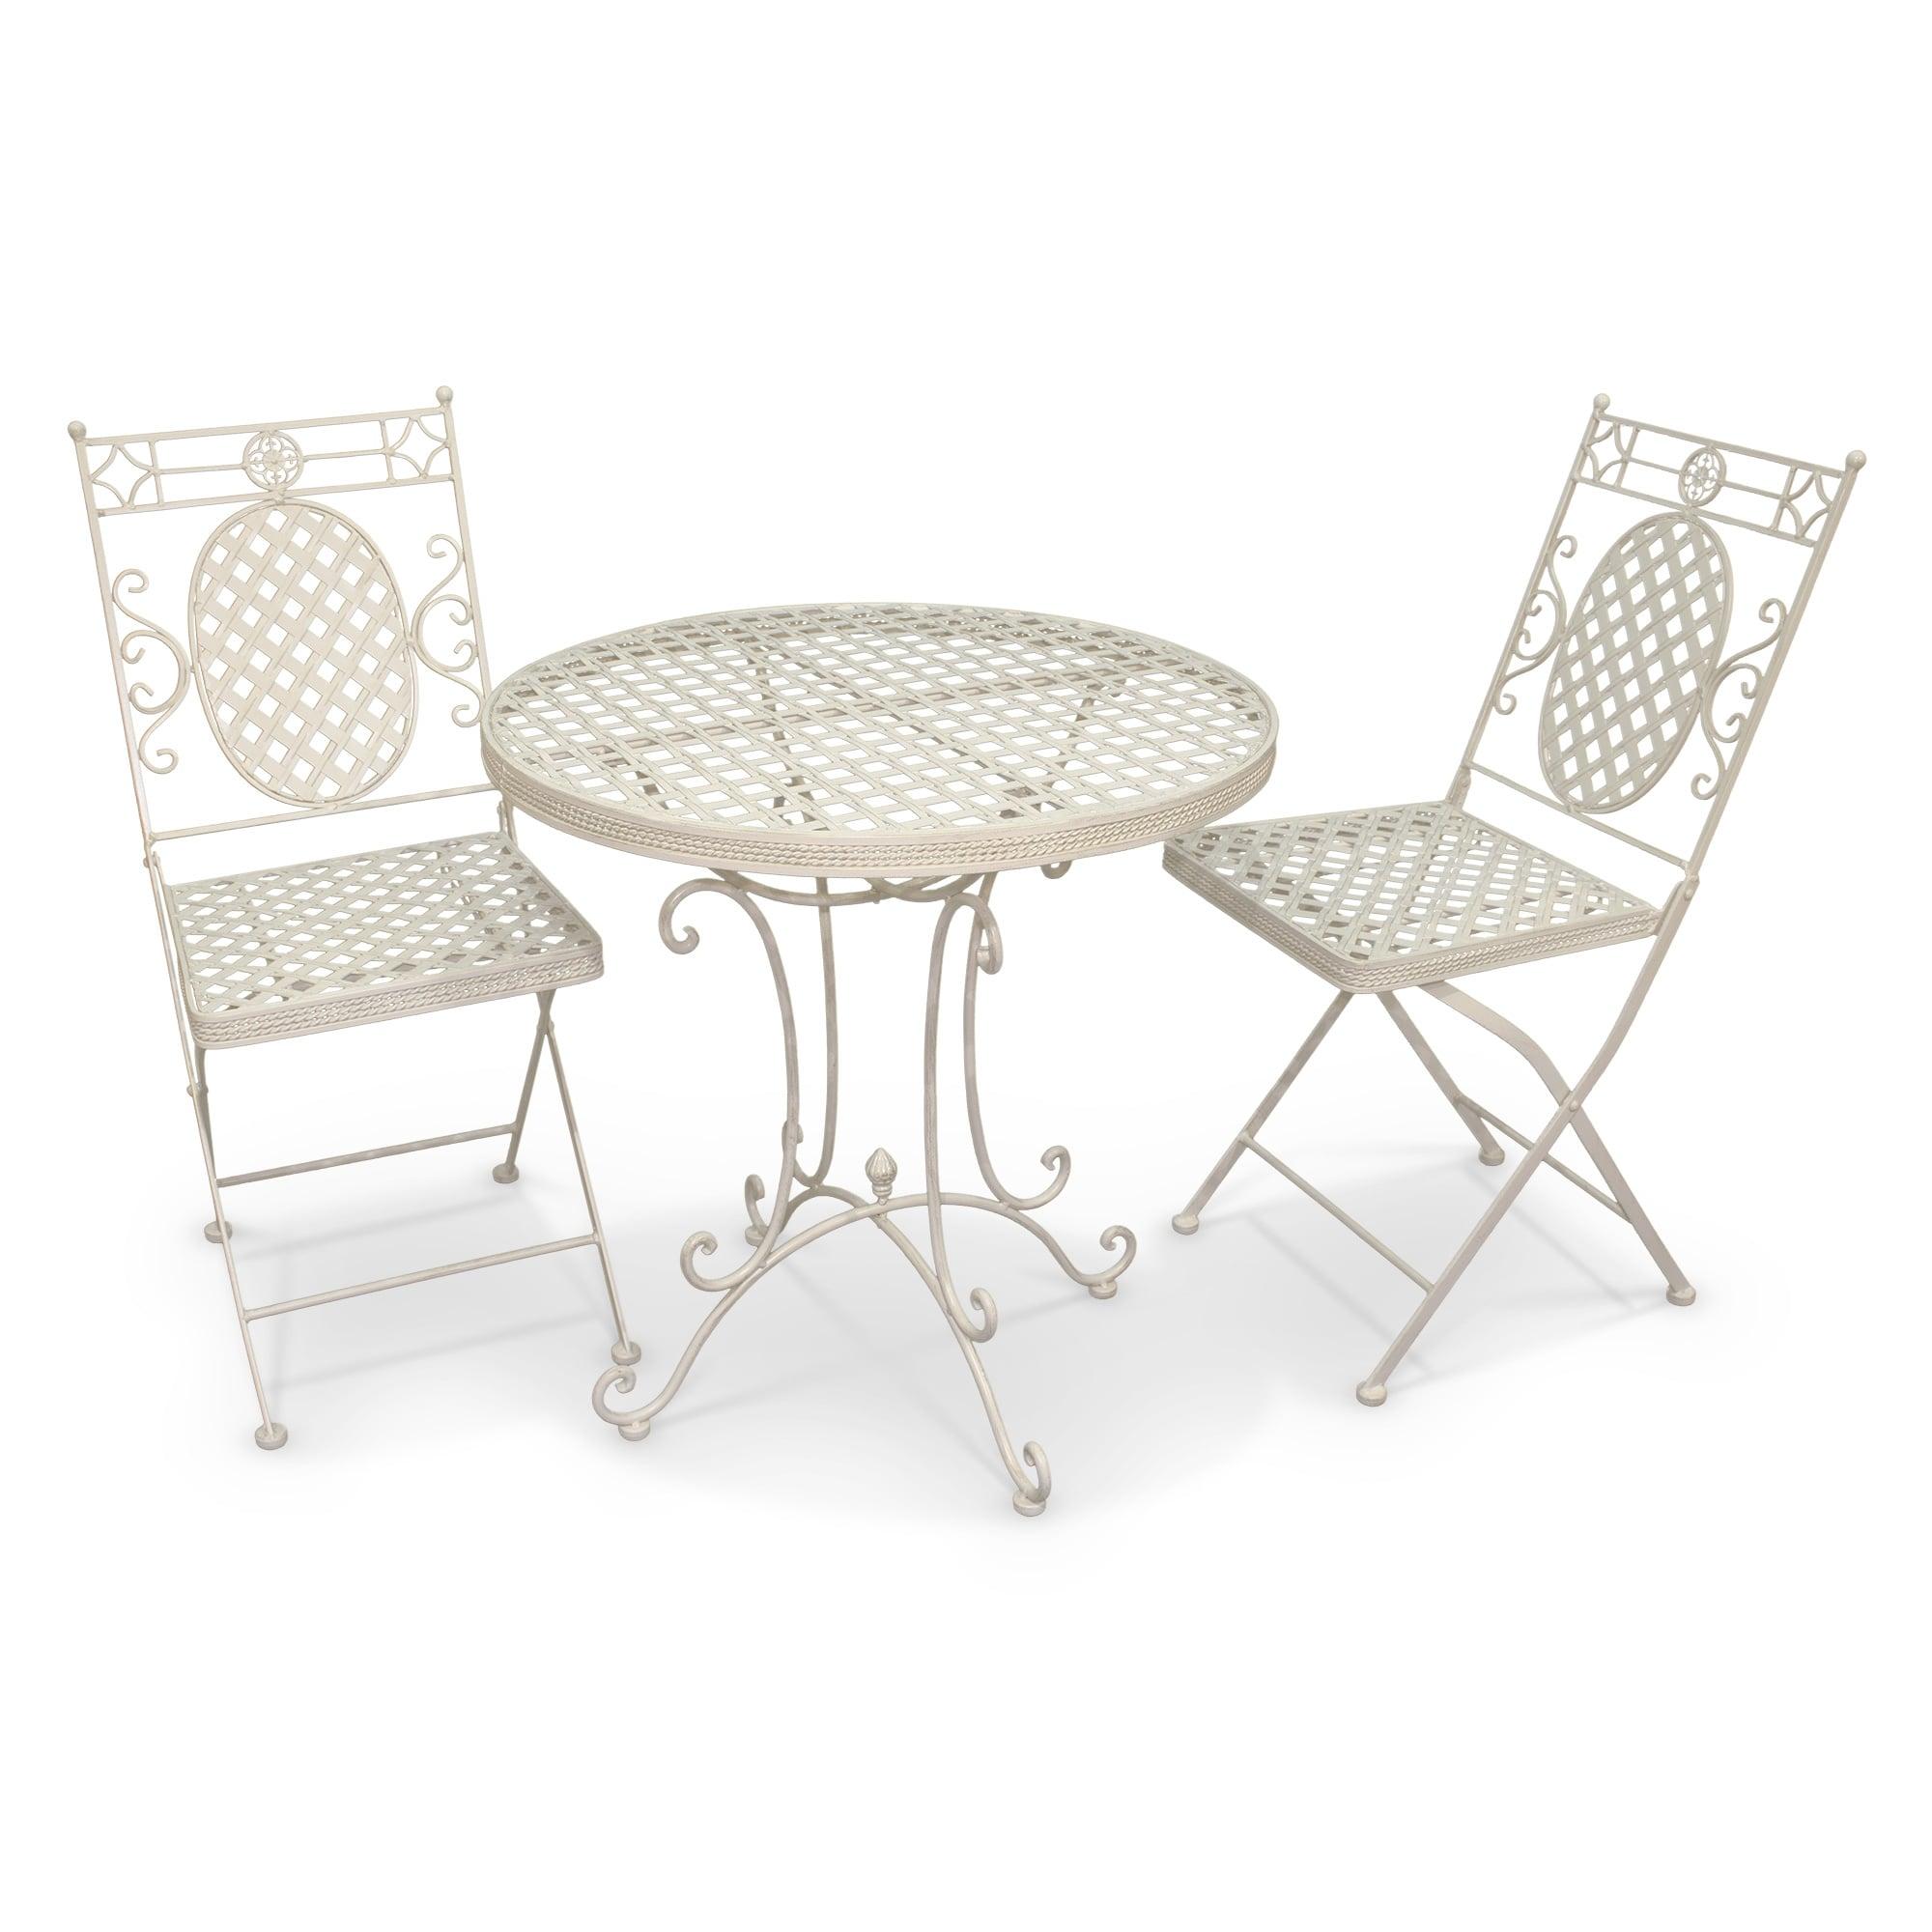 Metal Garden Furniture Metal Patio Furniture